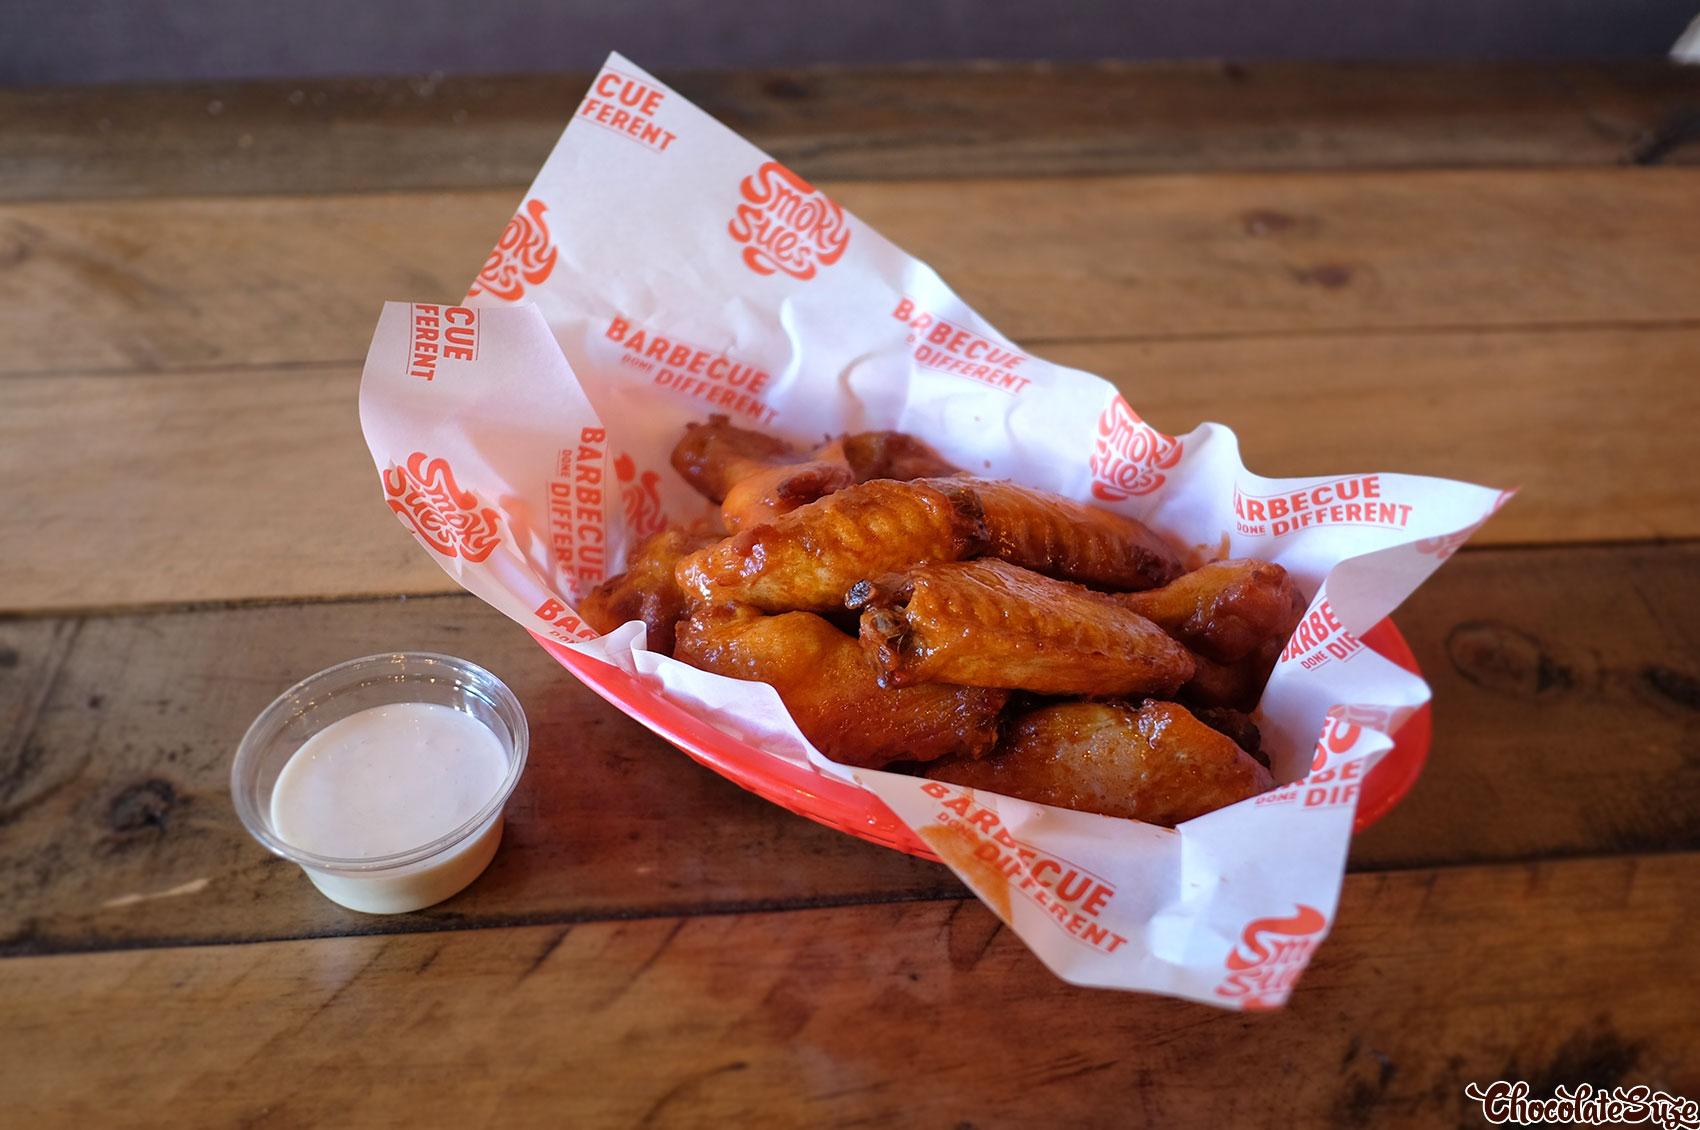 Hot wings at Smoky Sue's, Neutral Bay